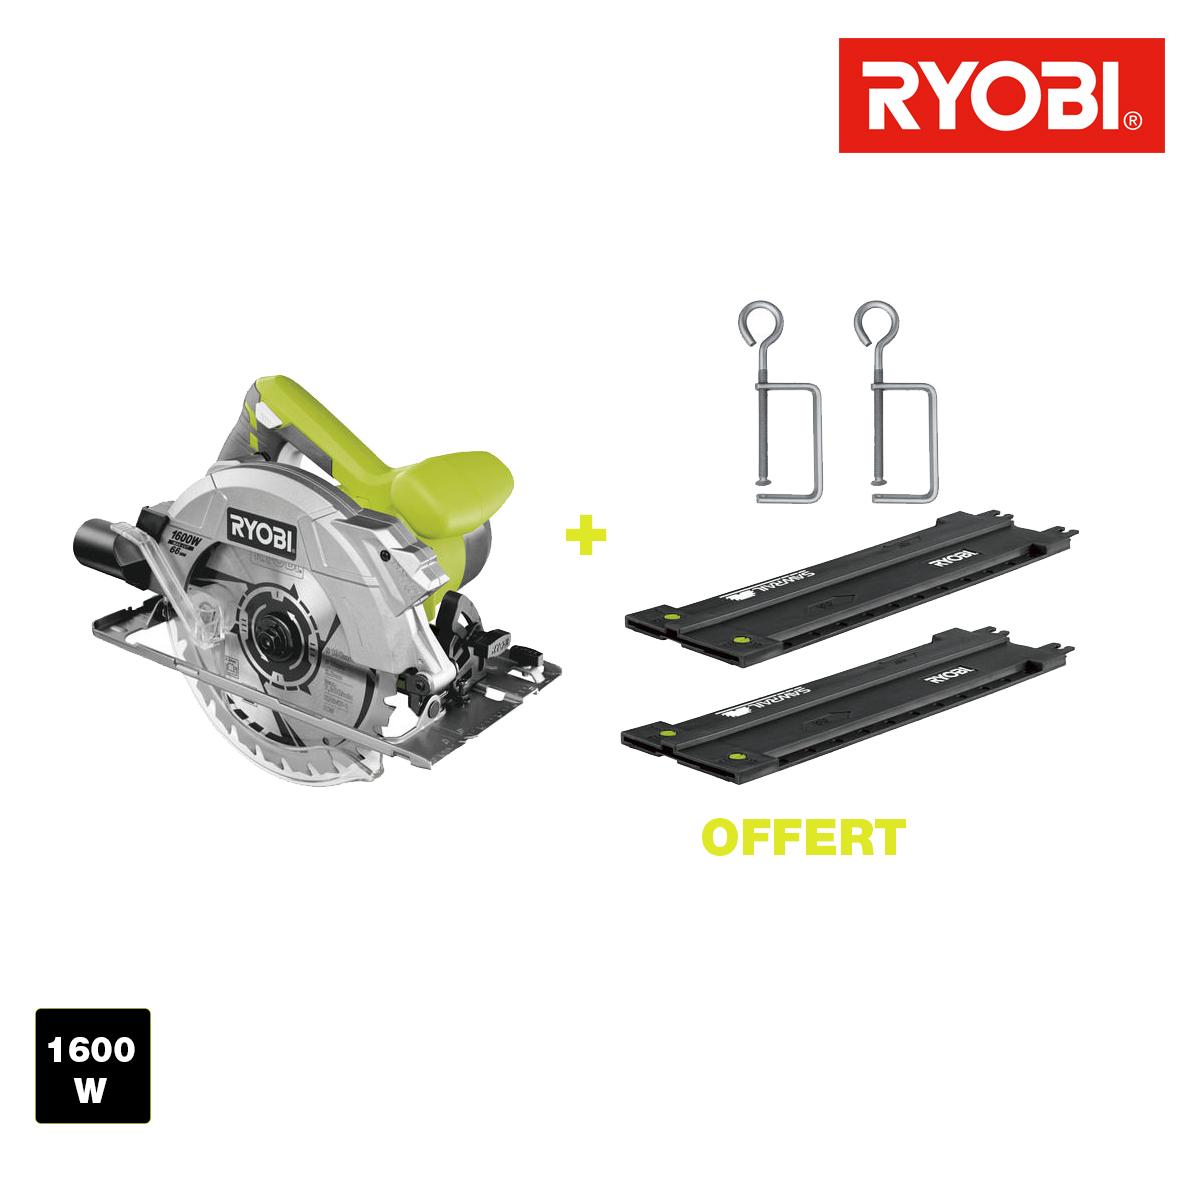 ryobi scie circulaire 1600w 66mm guide de coupe 122 cm 2 serre joints rcs1600 k2b. Black Bedroom Furniture Sets. Home Design Ideas